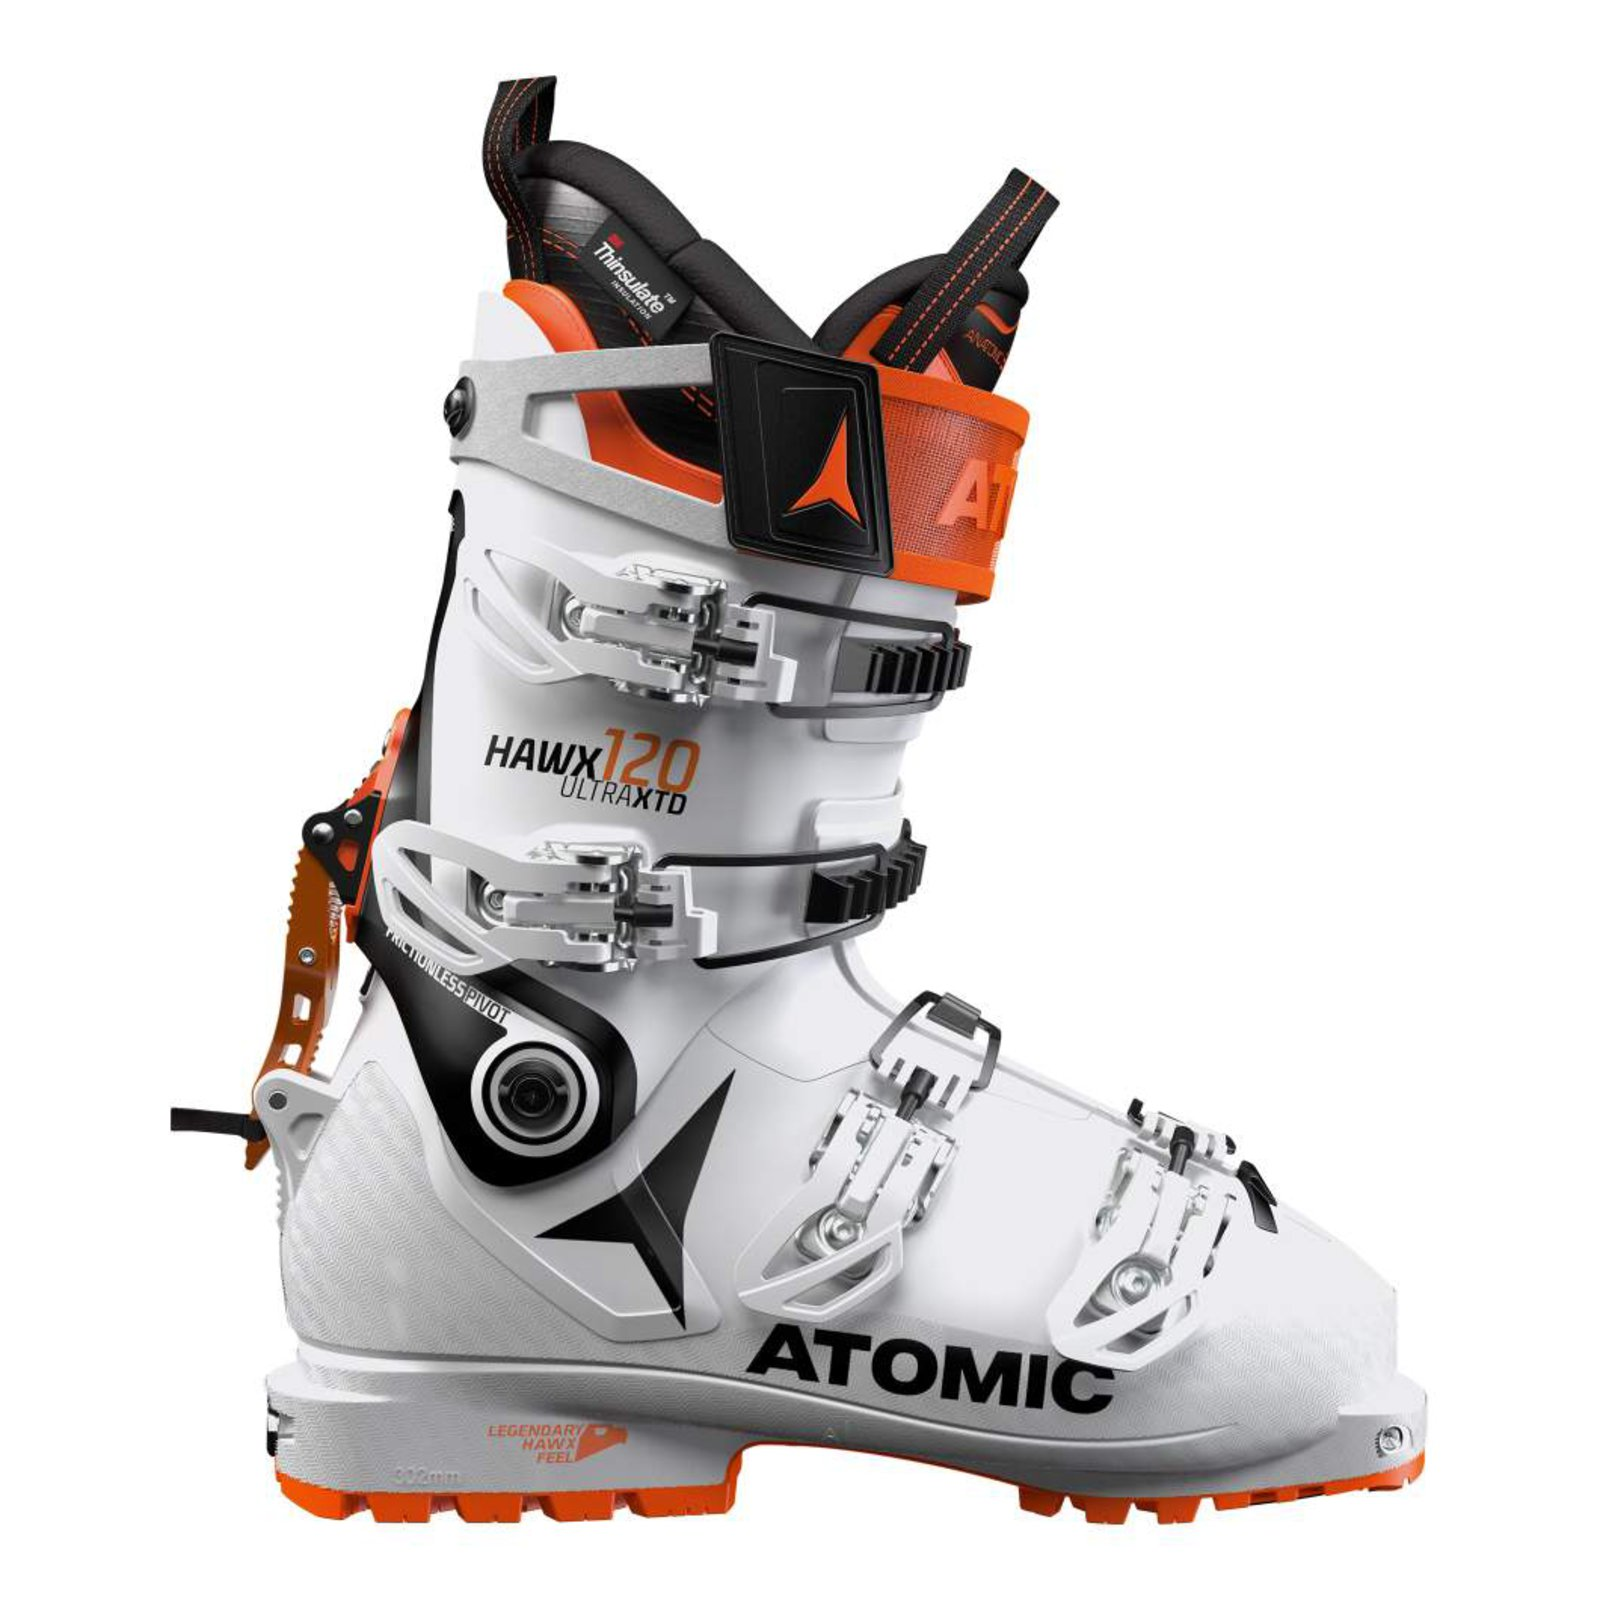 Lyžařské boty ATOMIC HAWX ULTRA XTD 120 ce1645cf45